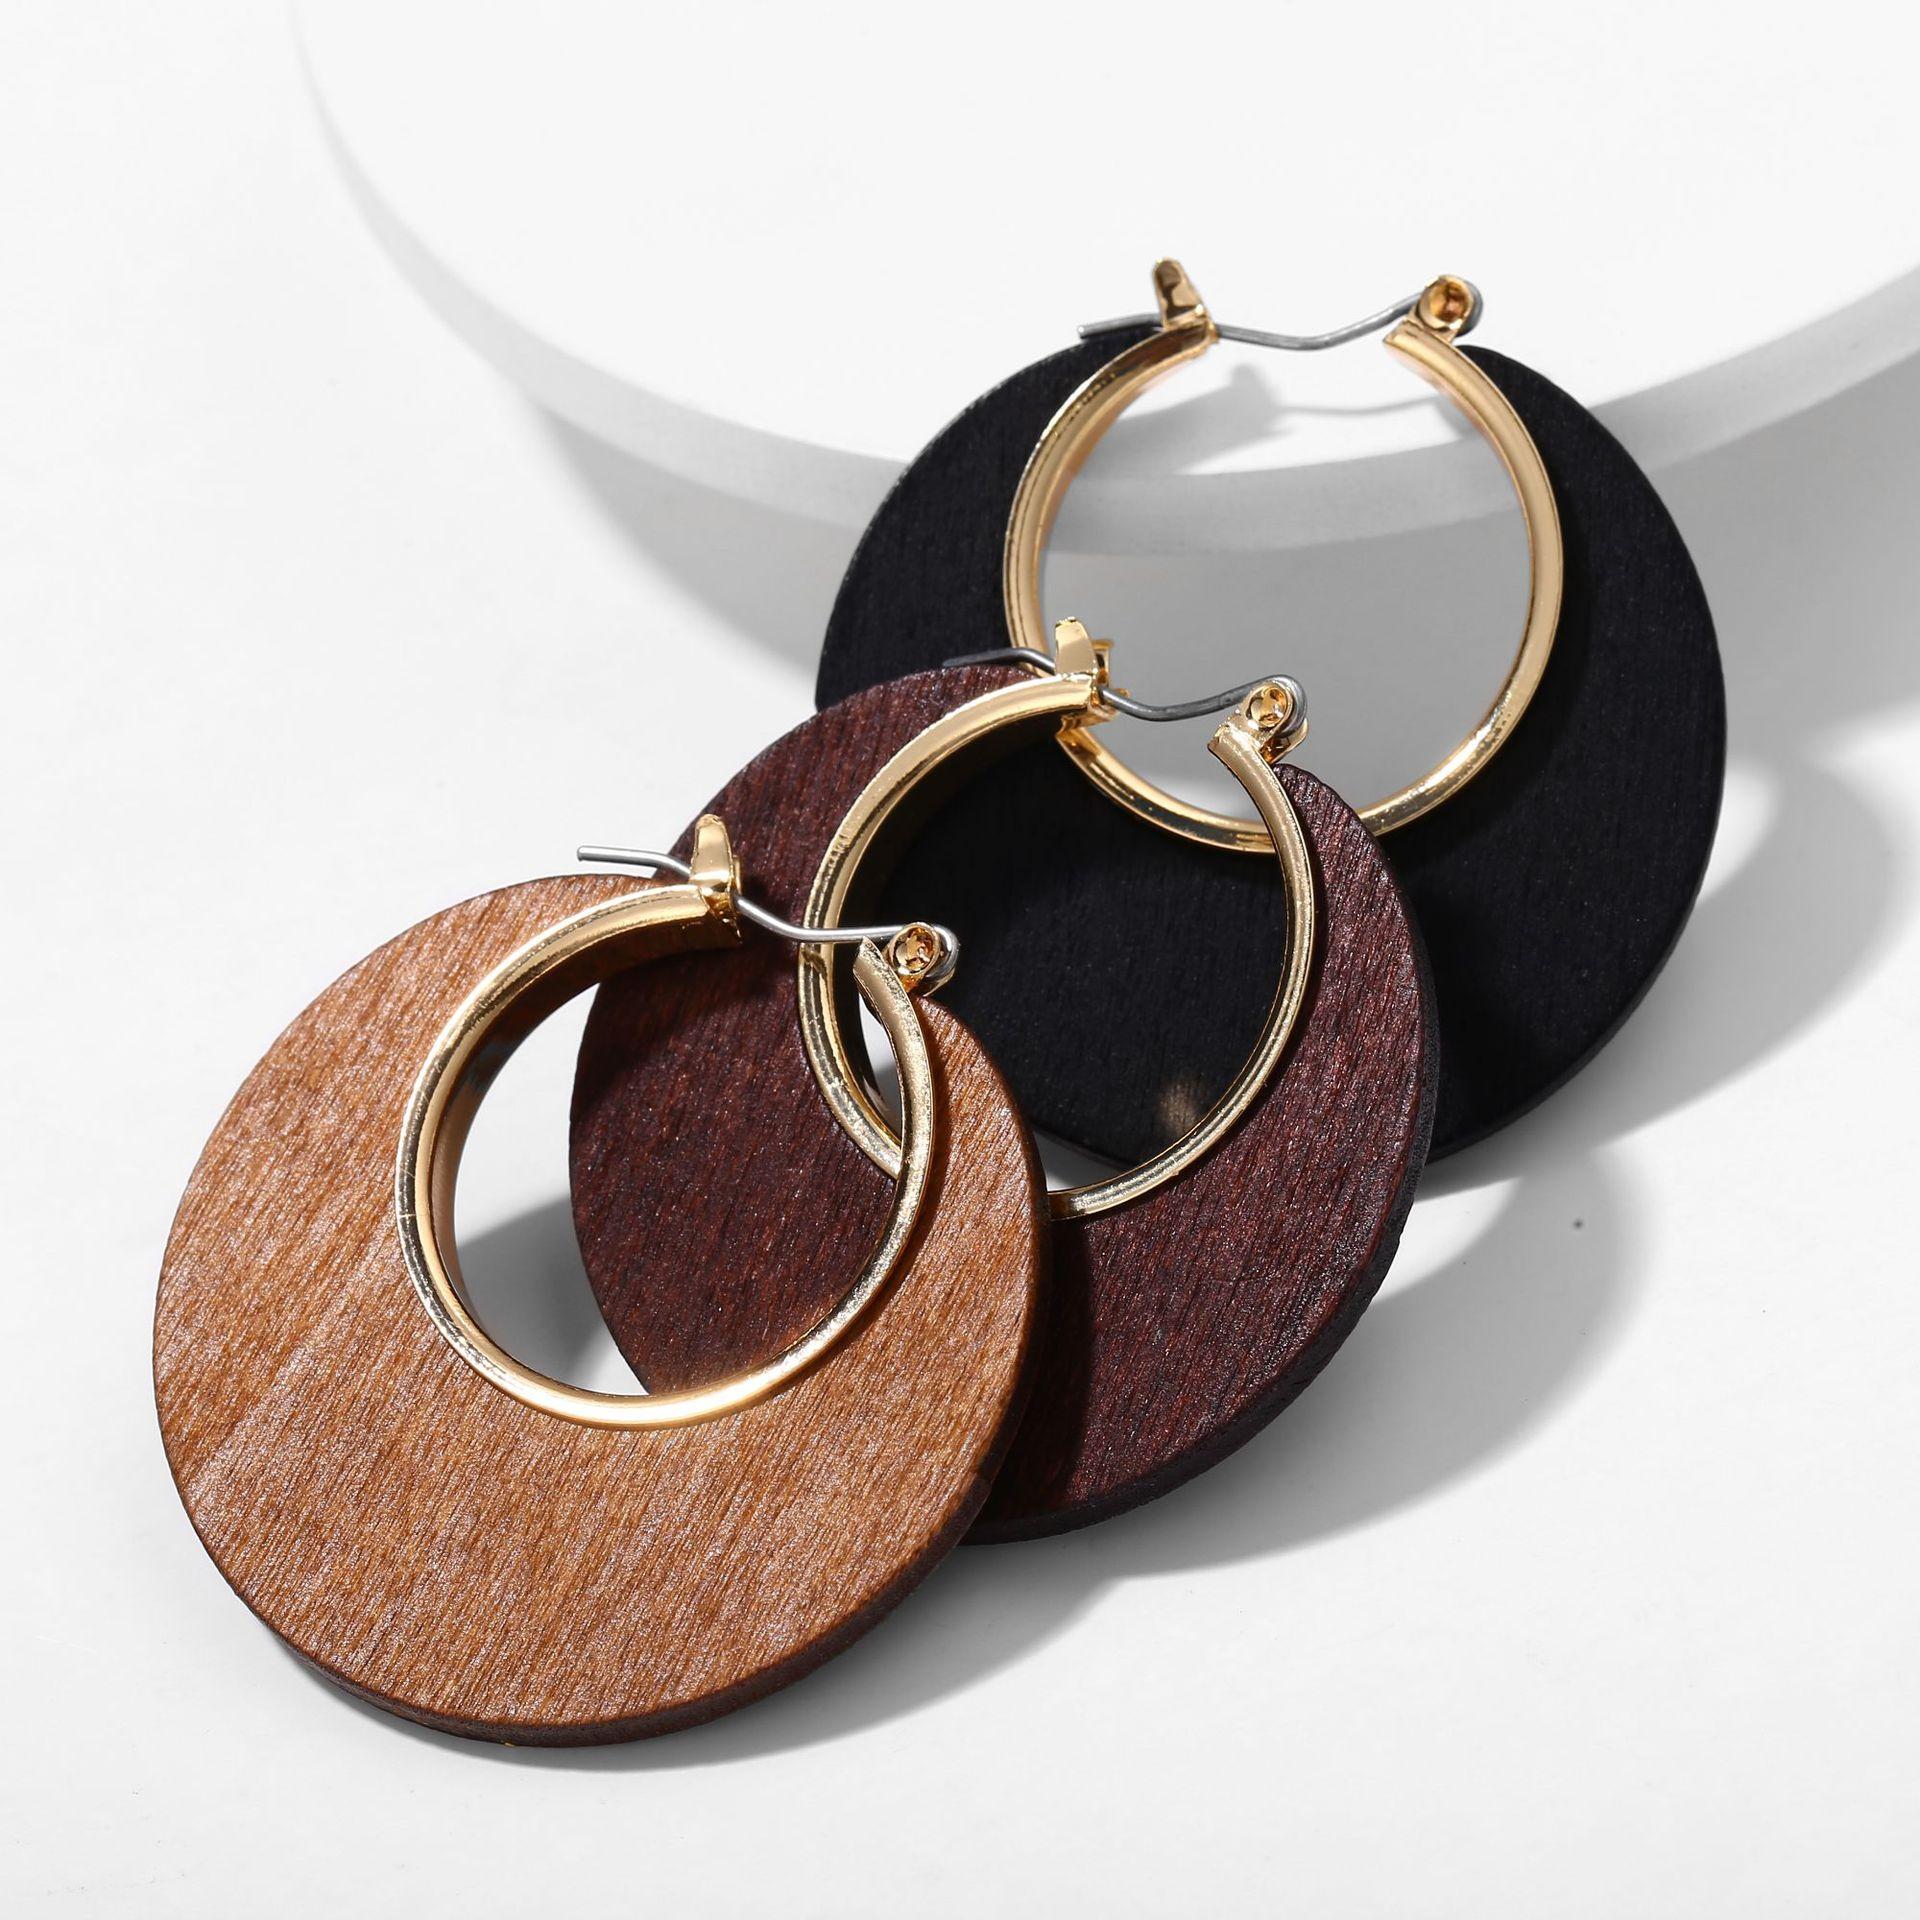 Fashion Elegant Geometric Wooden Hoop Earring For Women Lady New Design Trendy Gold Color Hoop Earring Gift Jewelry